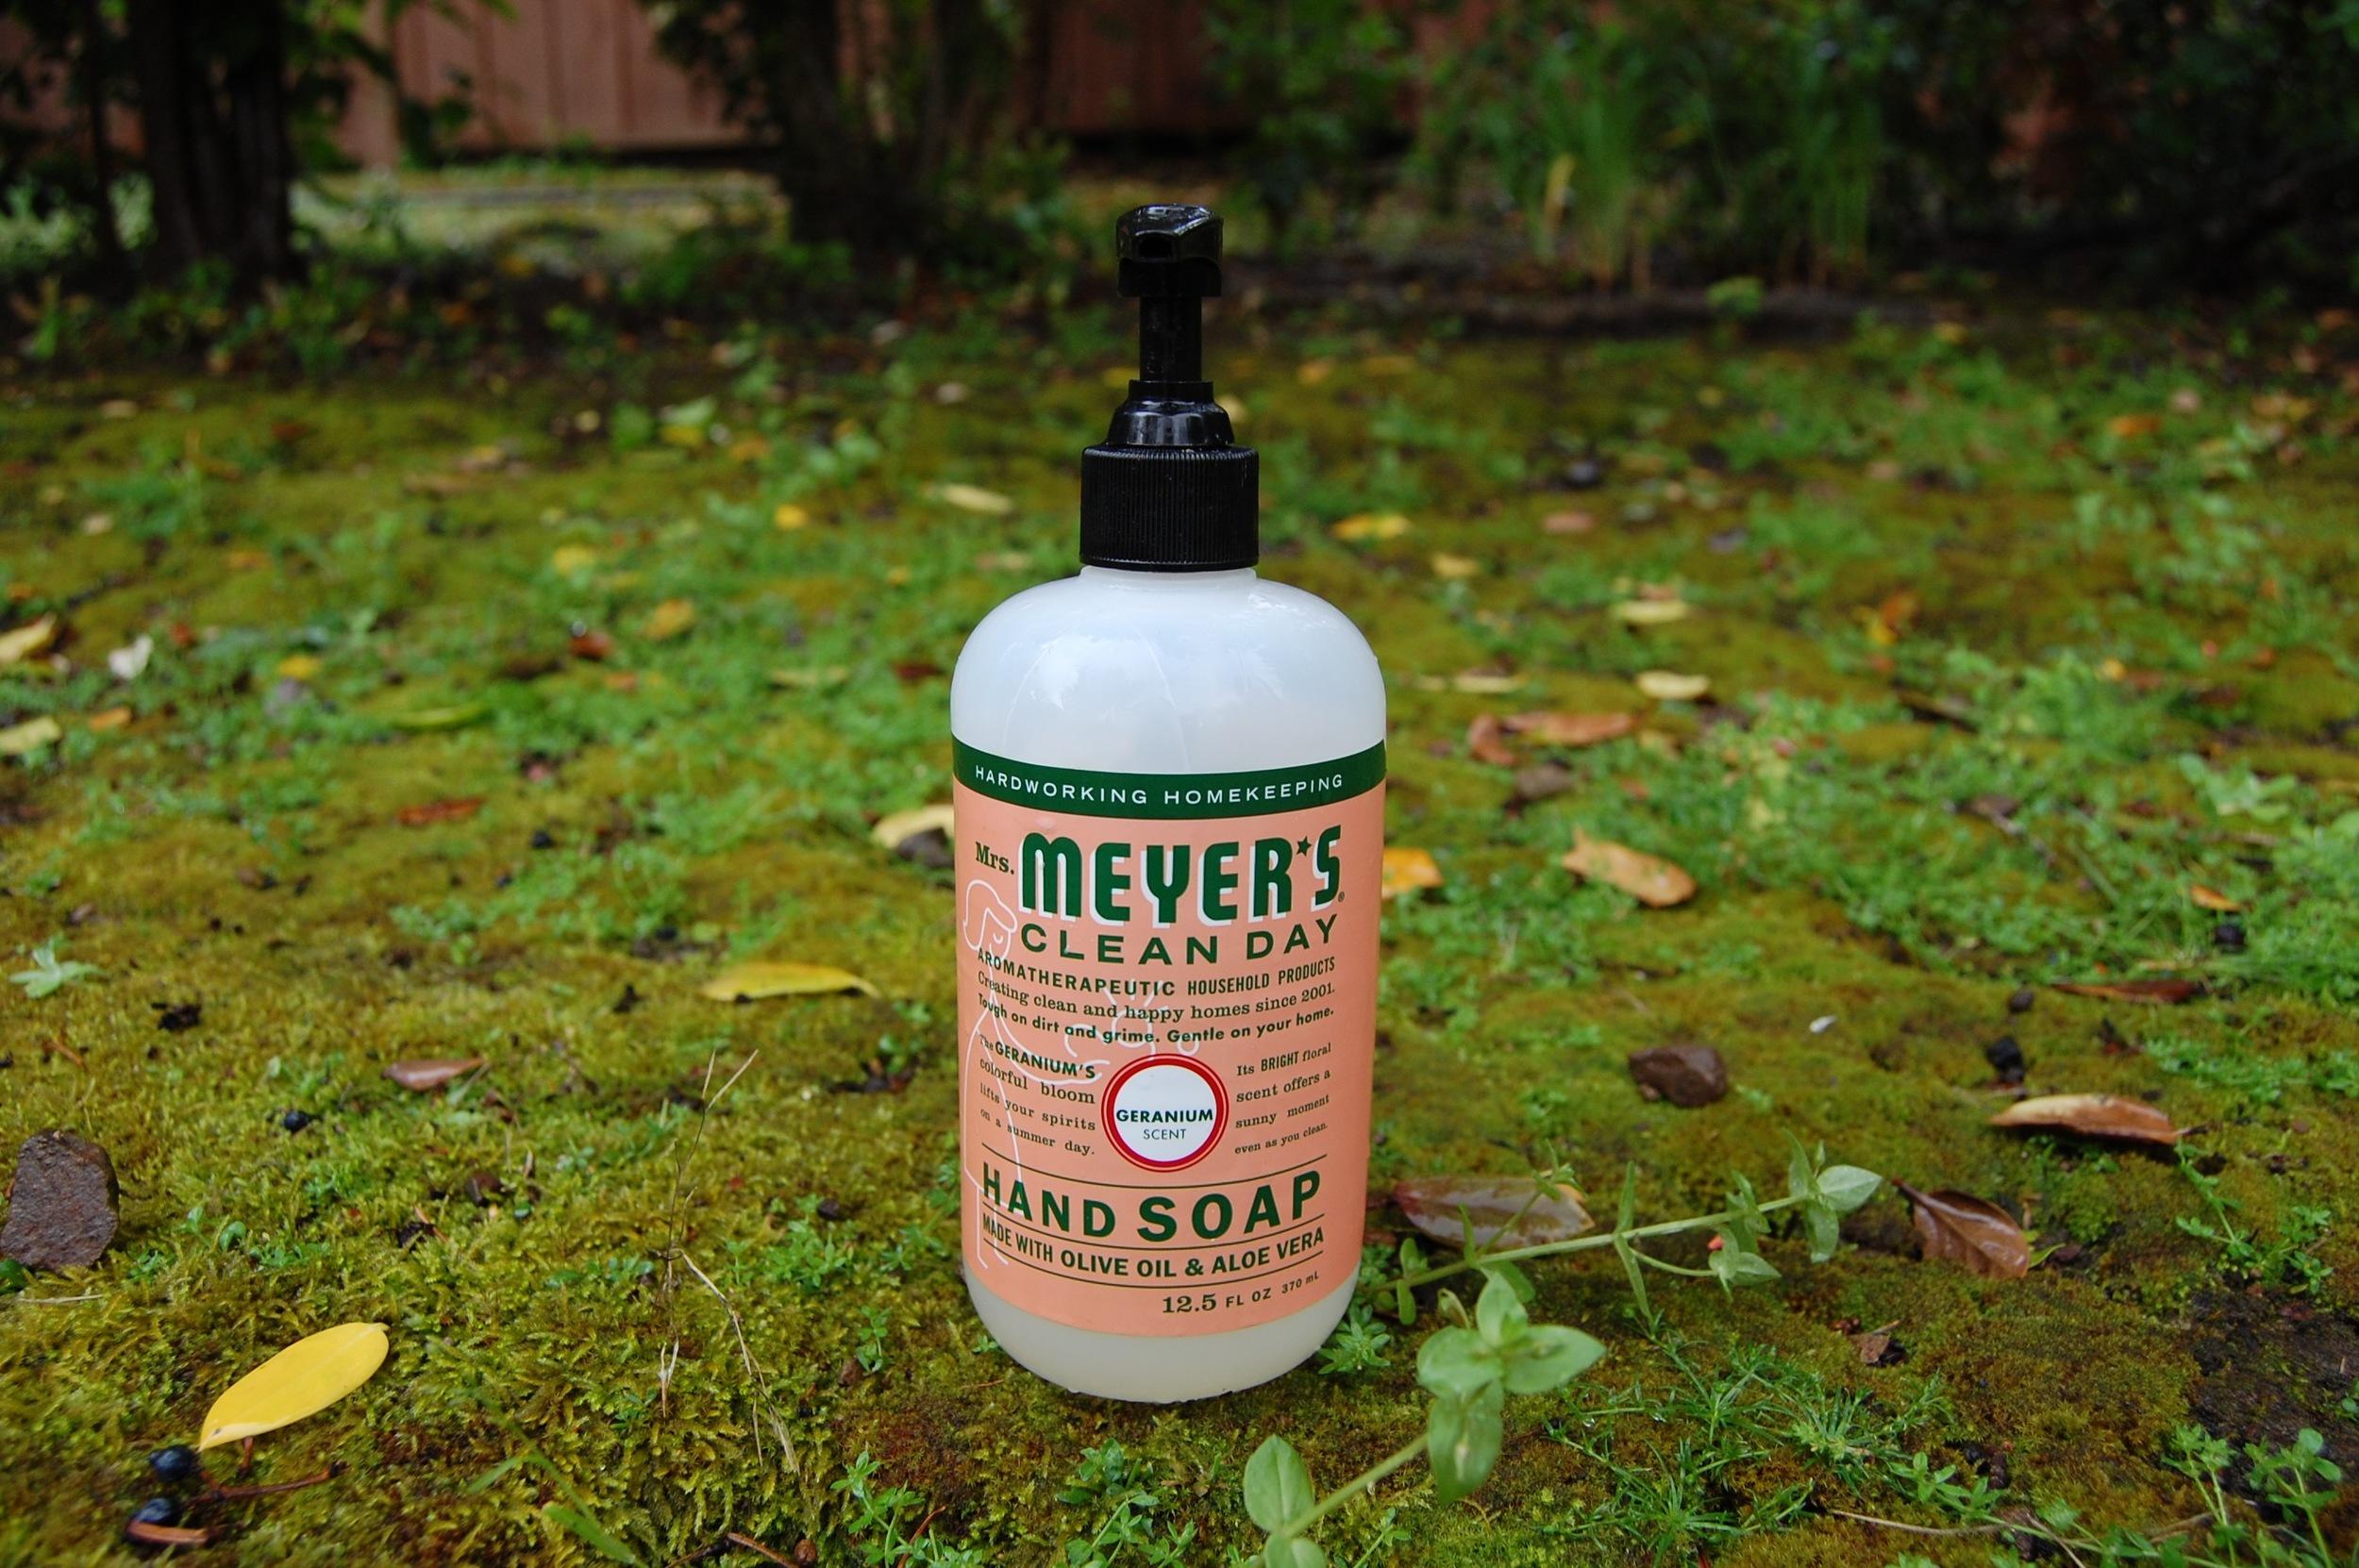 Mrs. Meyer's Clean Day Hand Soap, Geranium Scent